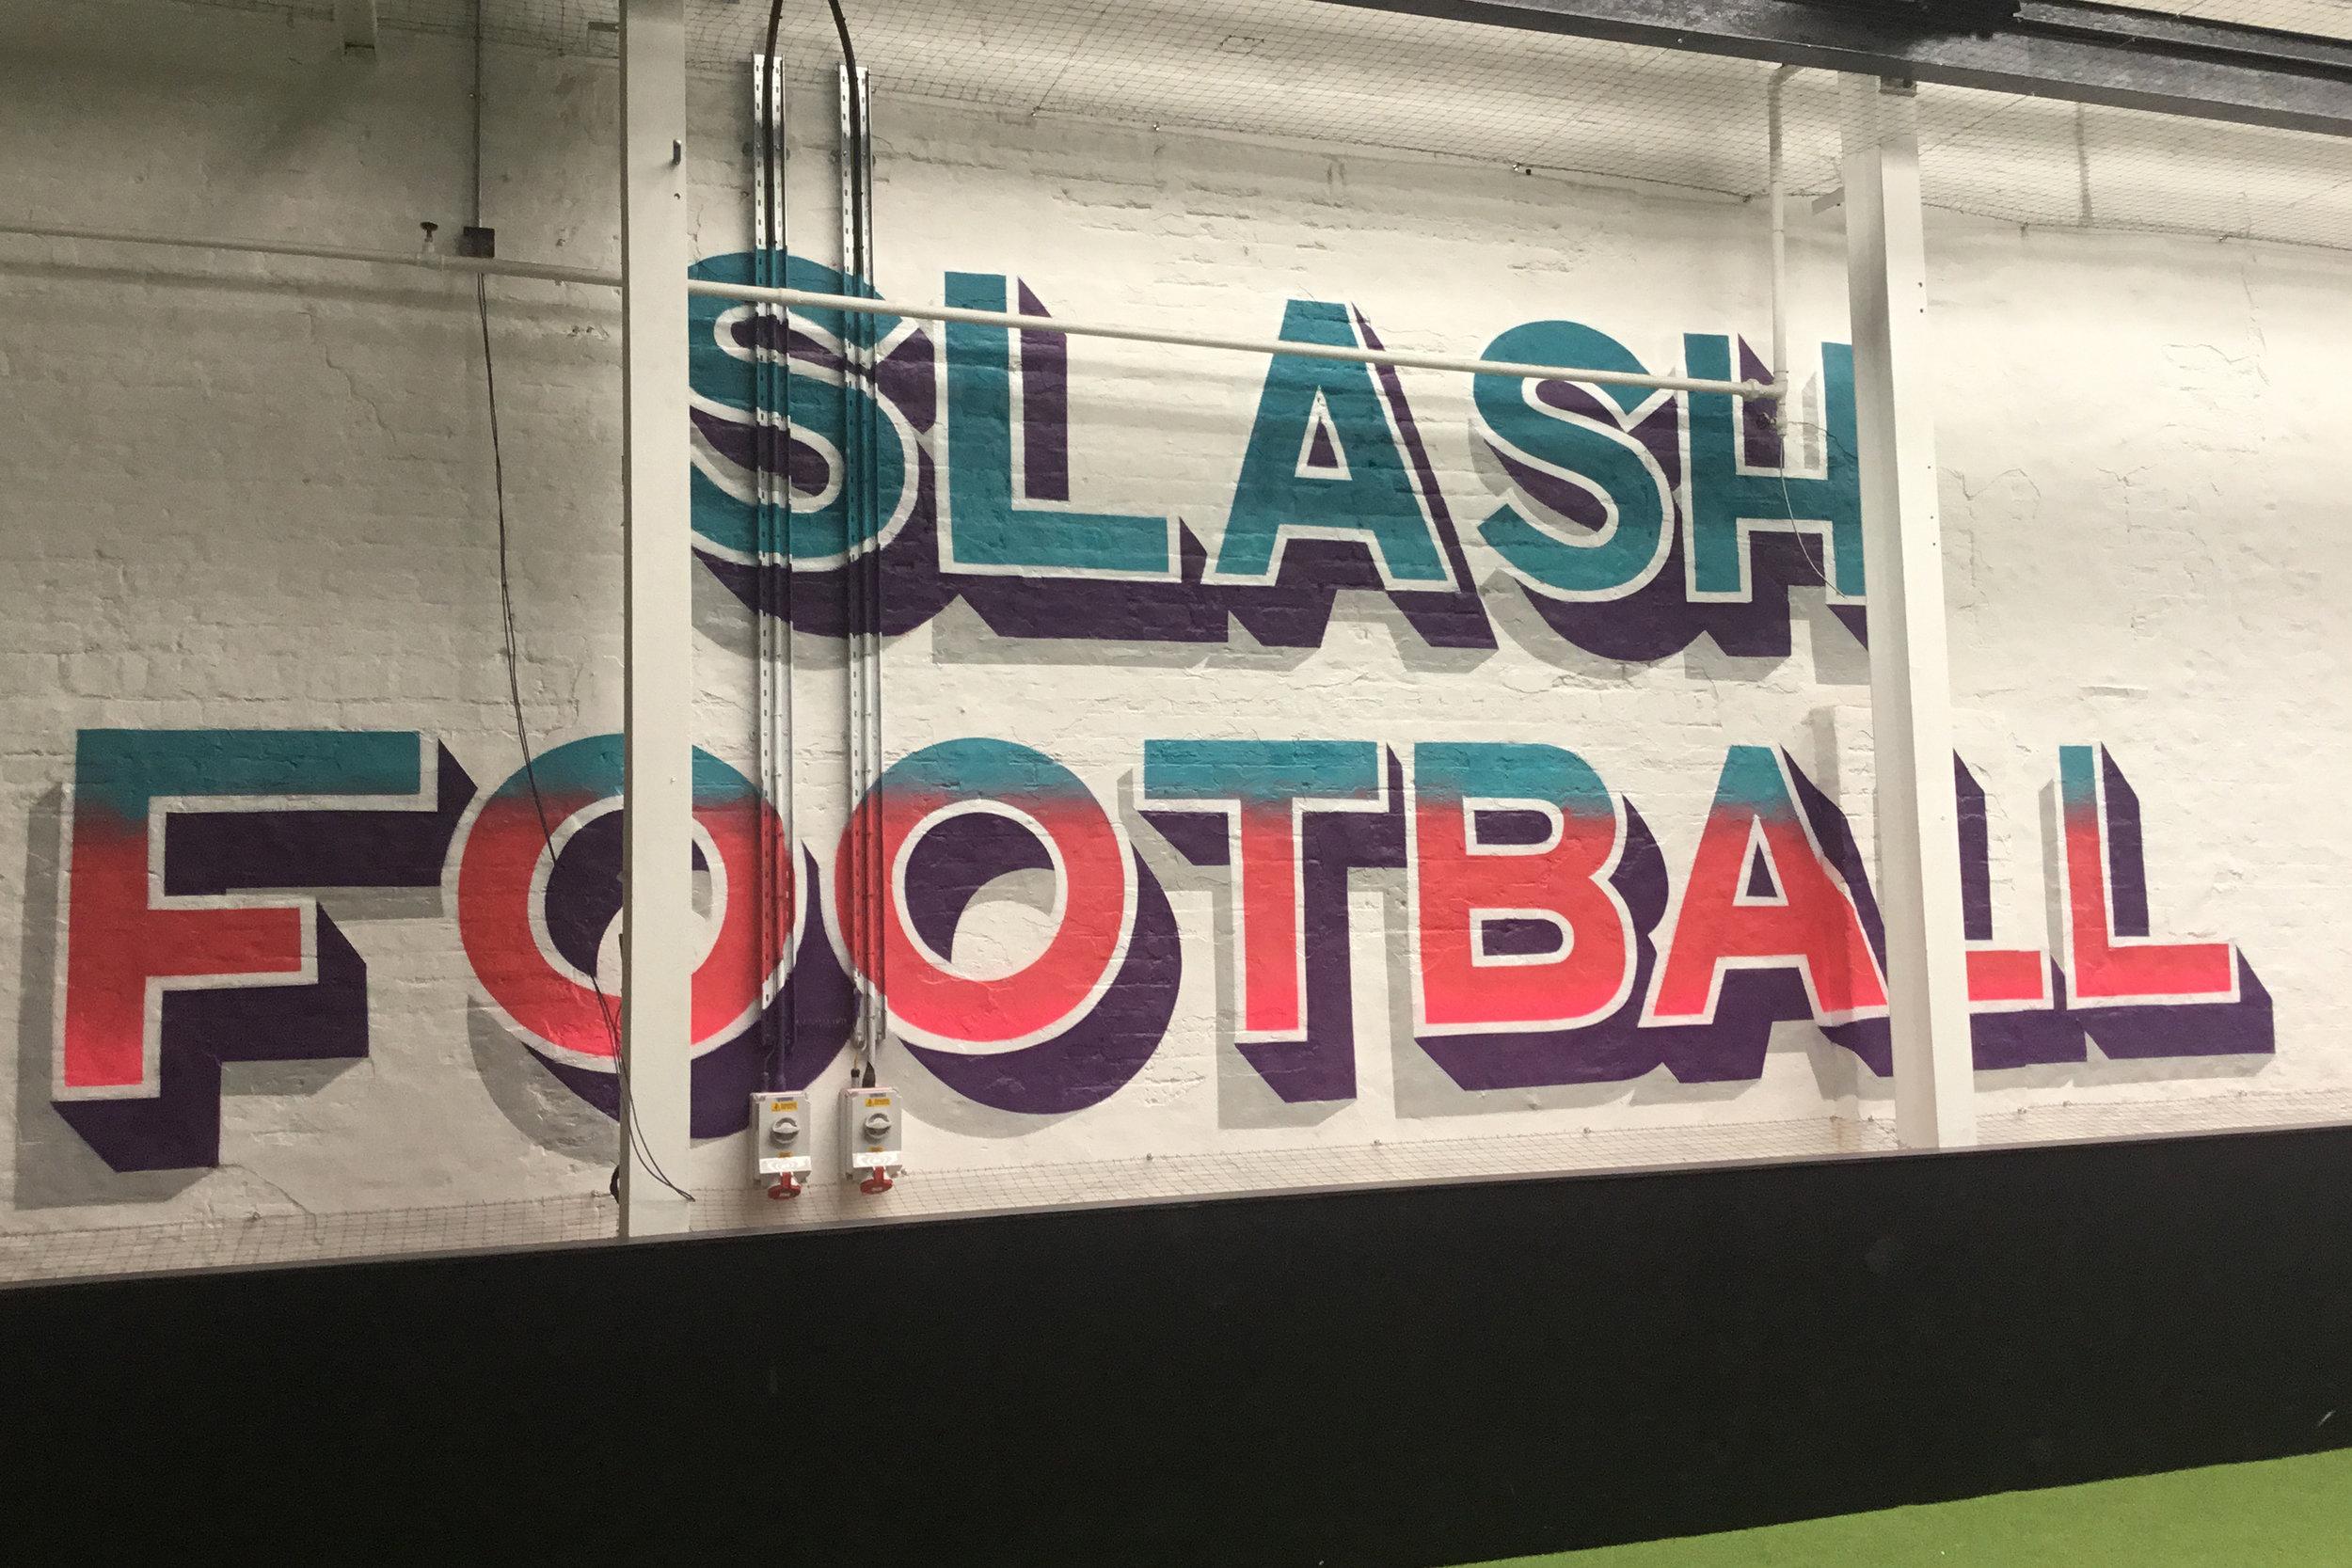 The London mural Company x Slash Football x GARY X Brave bison